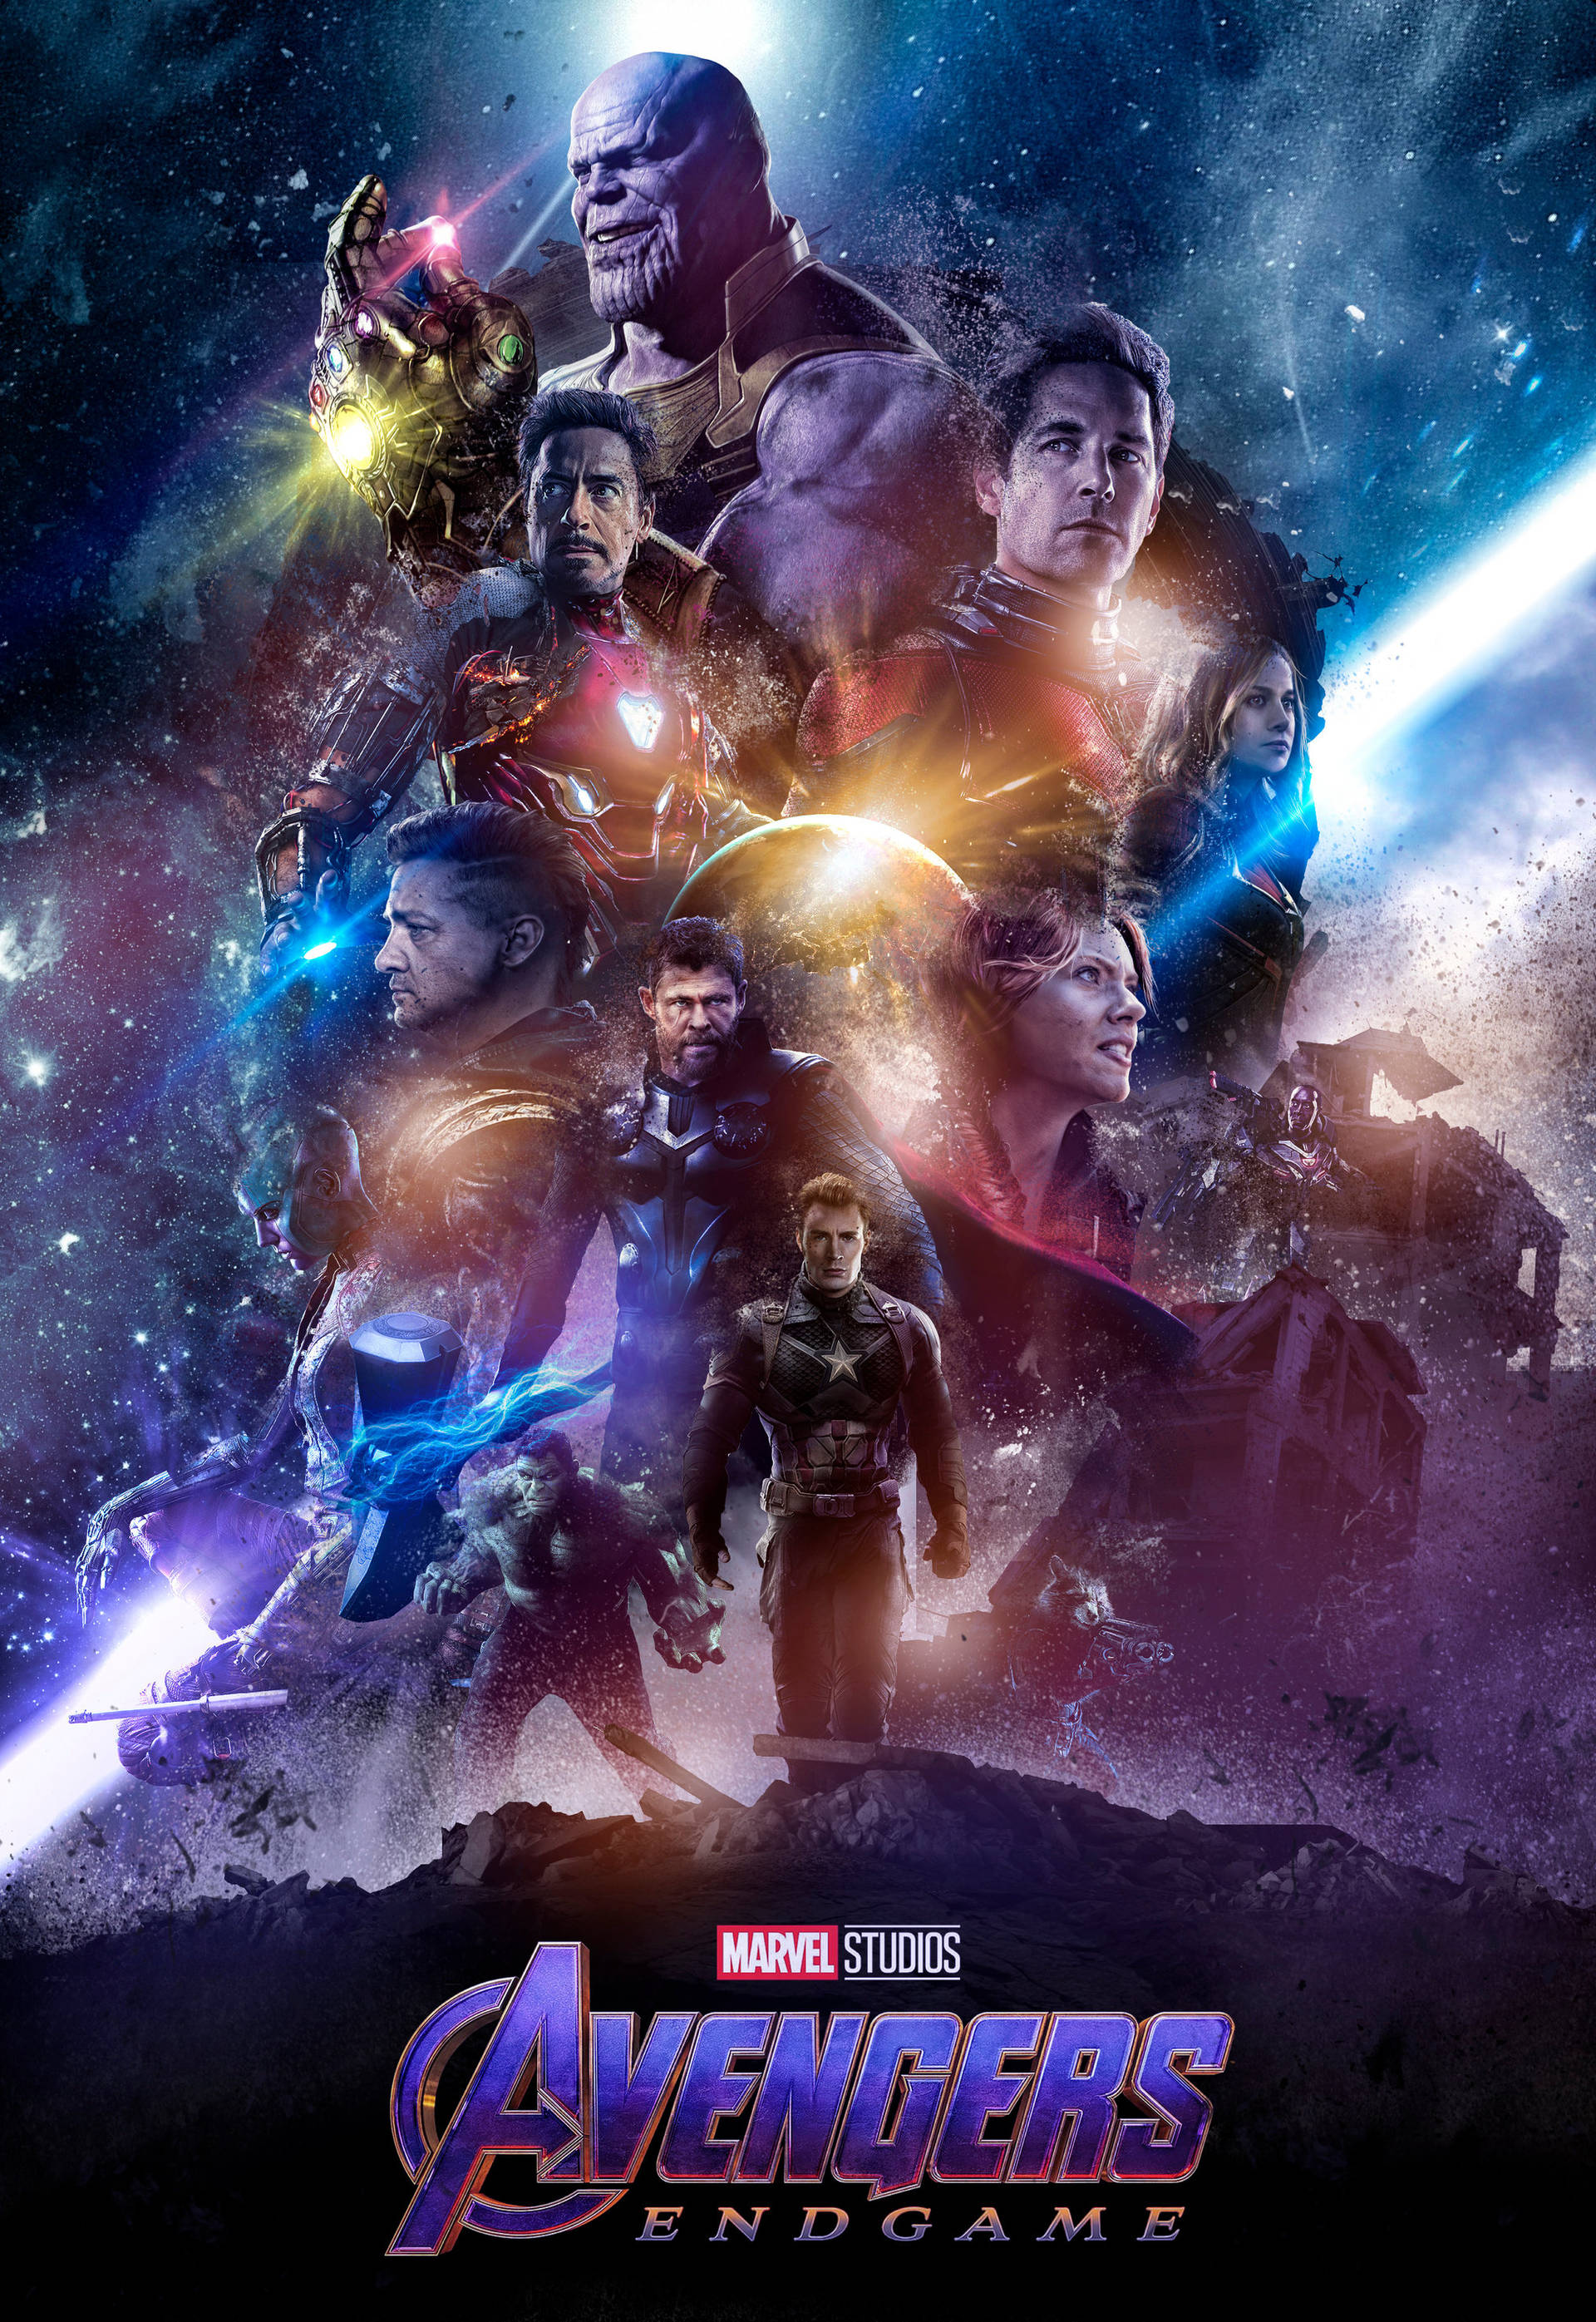 Avengers endgame 2019 Download official trailer Mp4